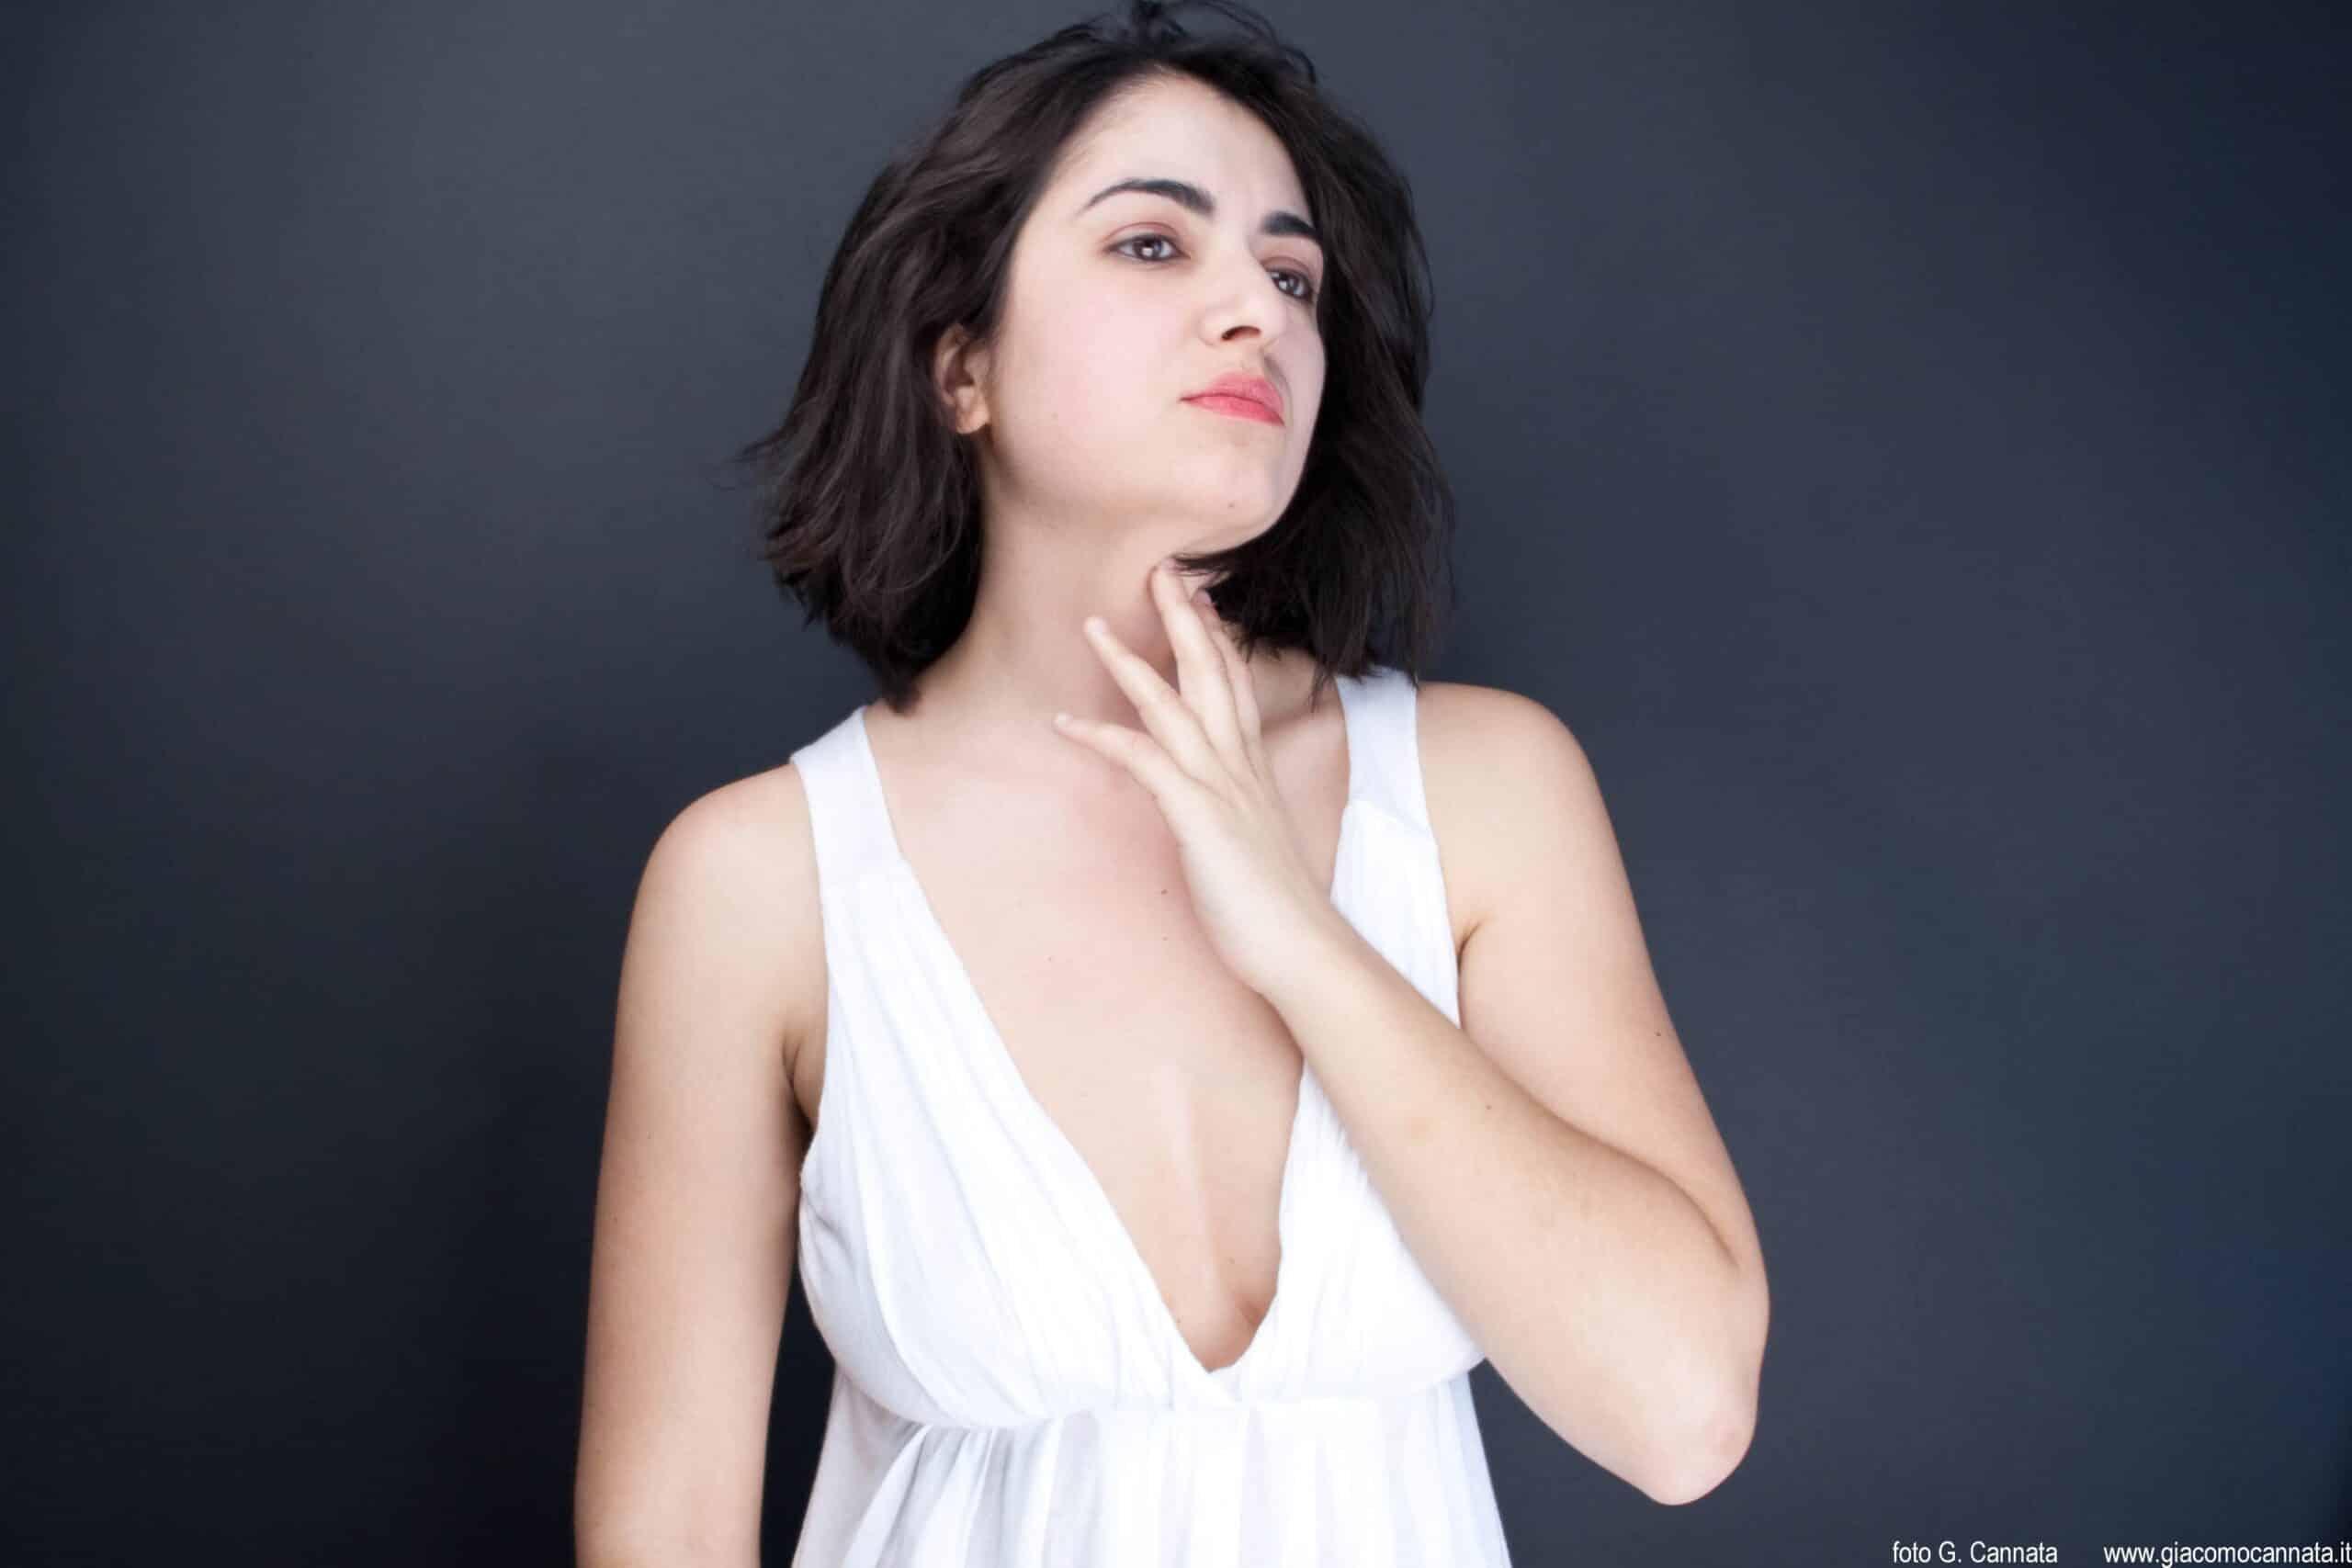 Intervista ad Alessandra Mortelliti